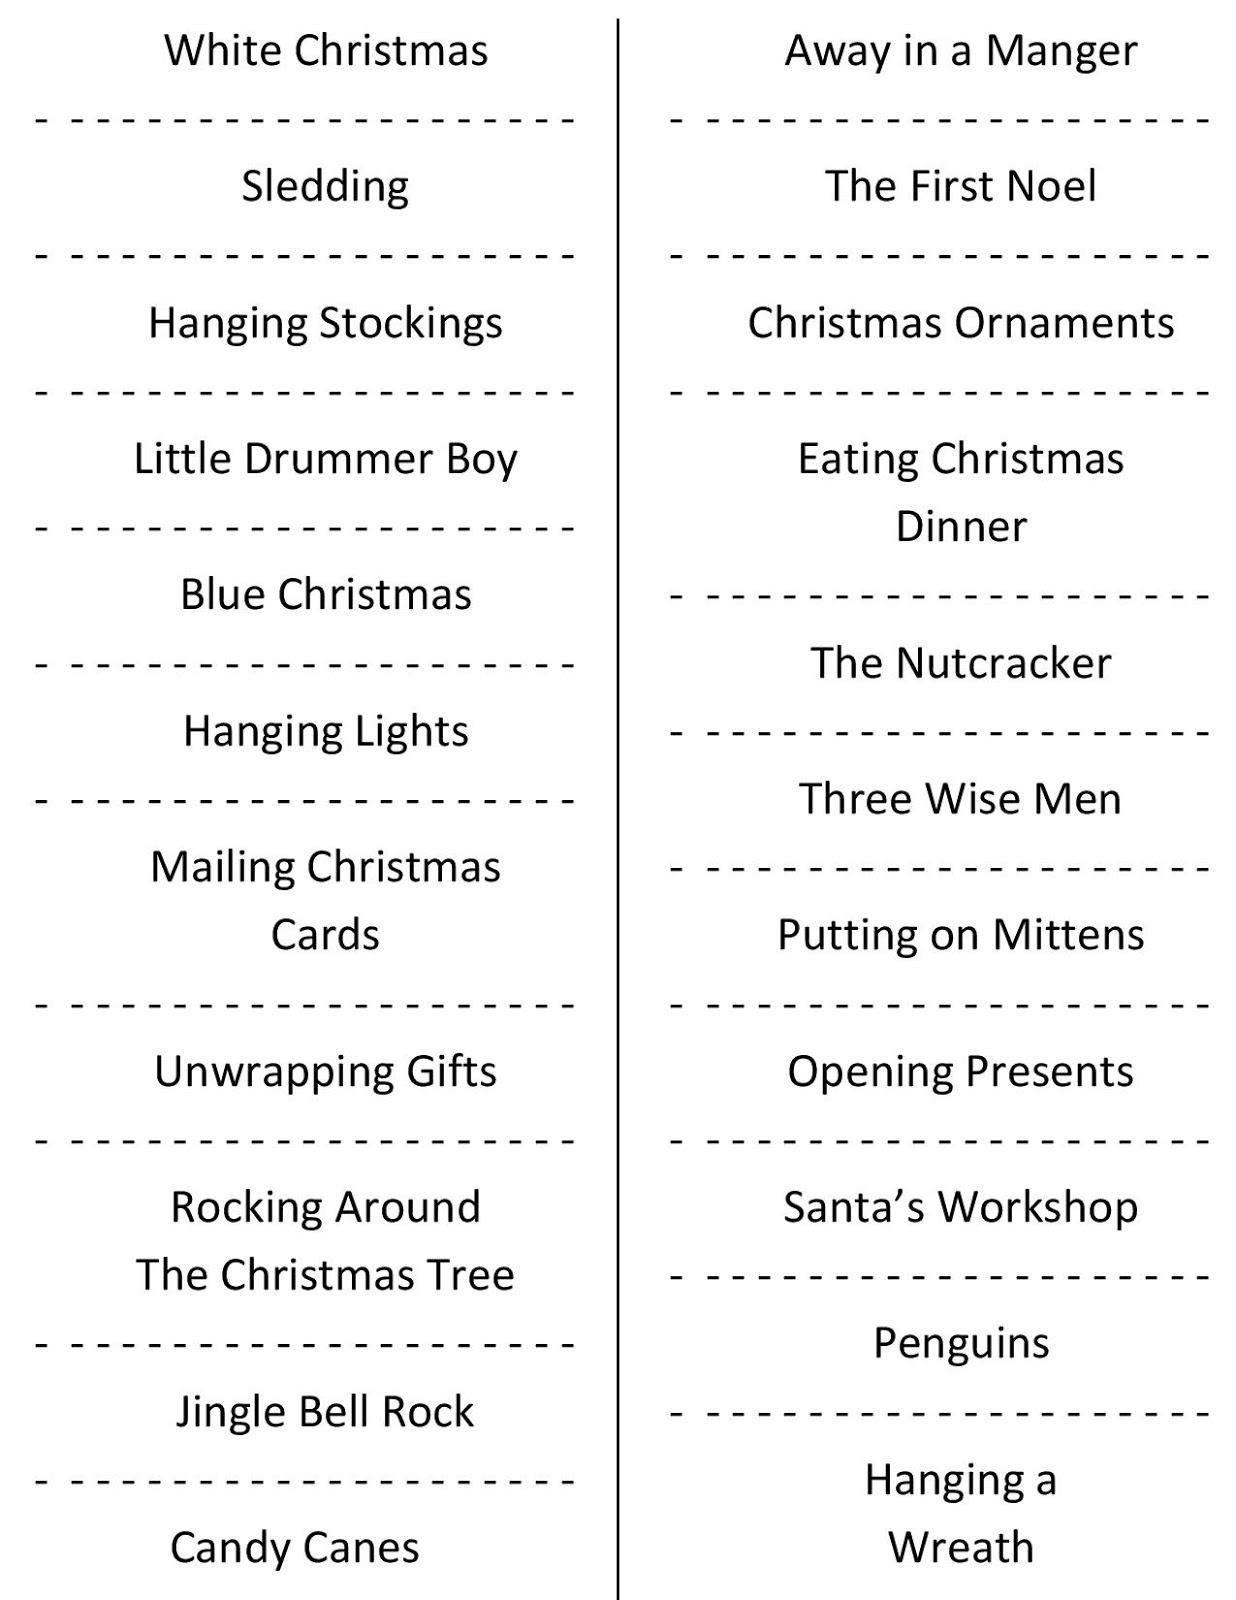 Christmas Charades (Free Printable Party Game) - Holiday Office Party Games Free Printable